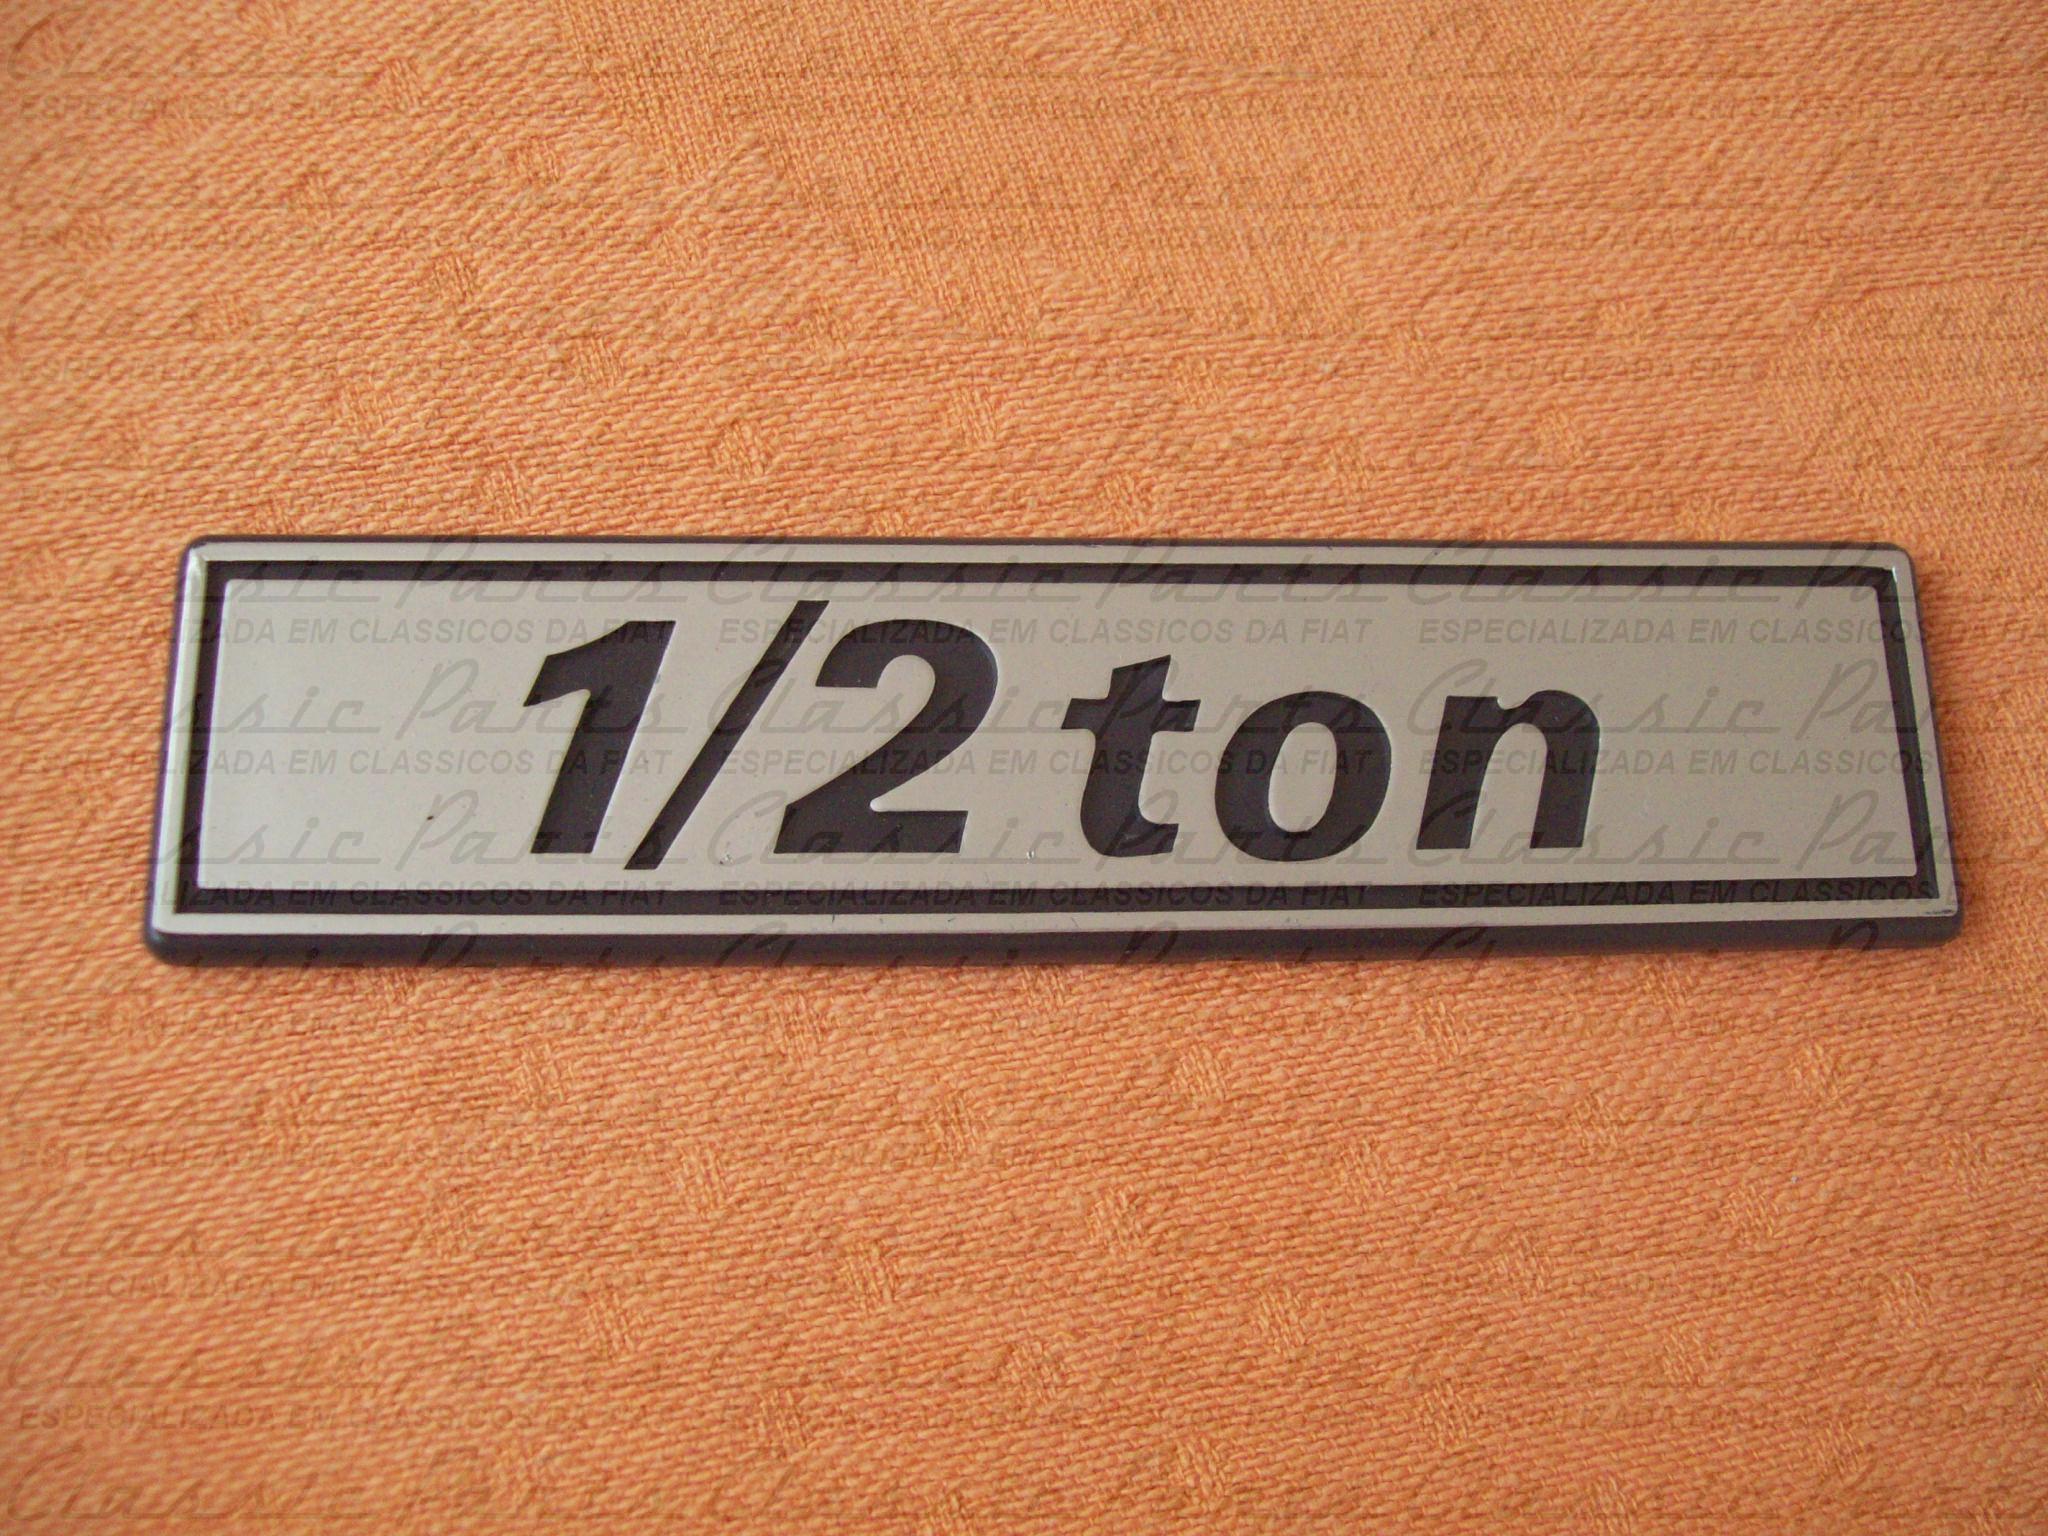 EMBLEMA LATERAL - 1/2 TON - FIAT 147 PICK UP/CITY/FIORINO/FURGAO